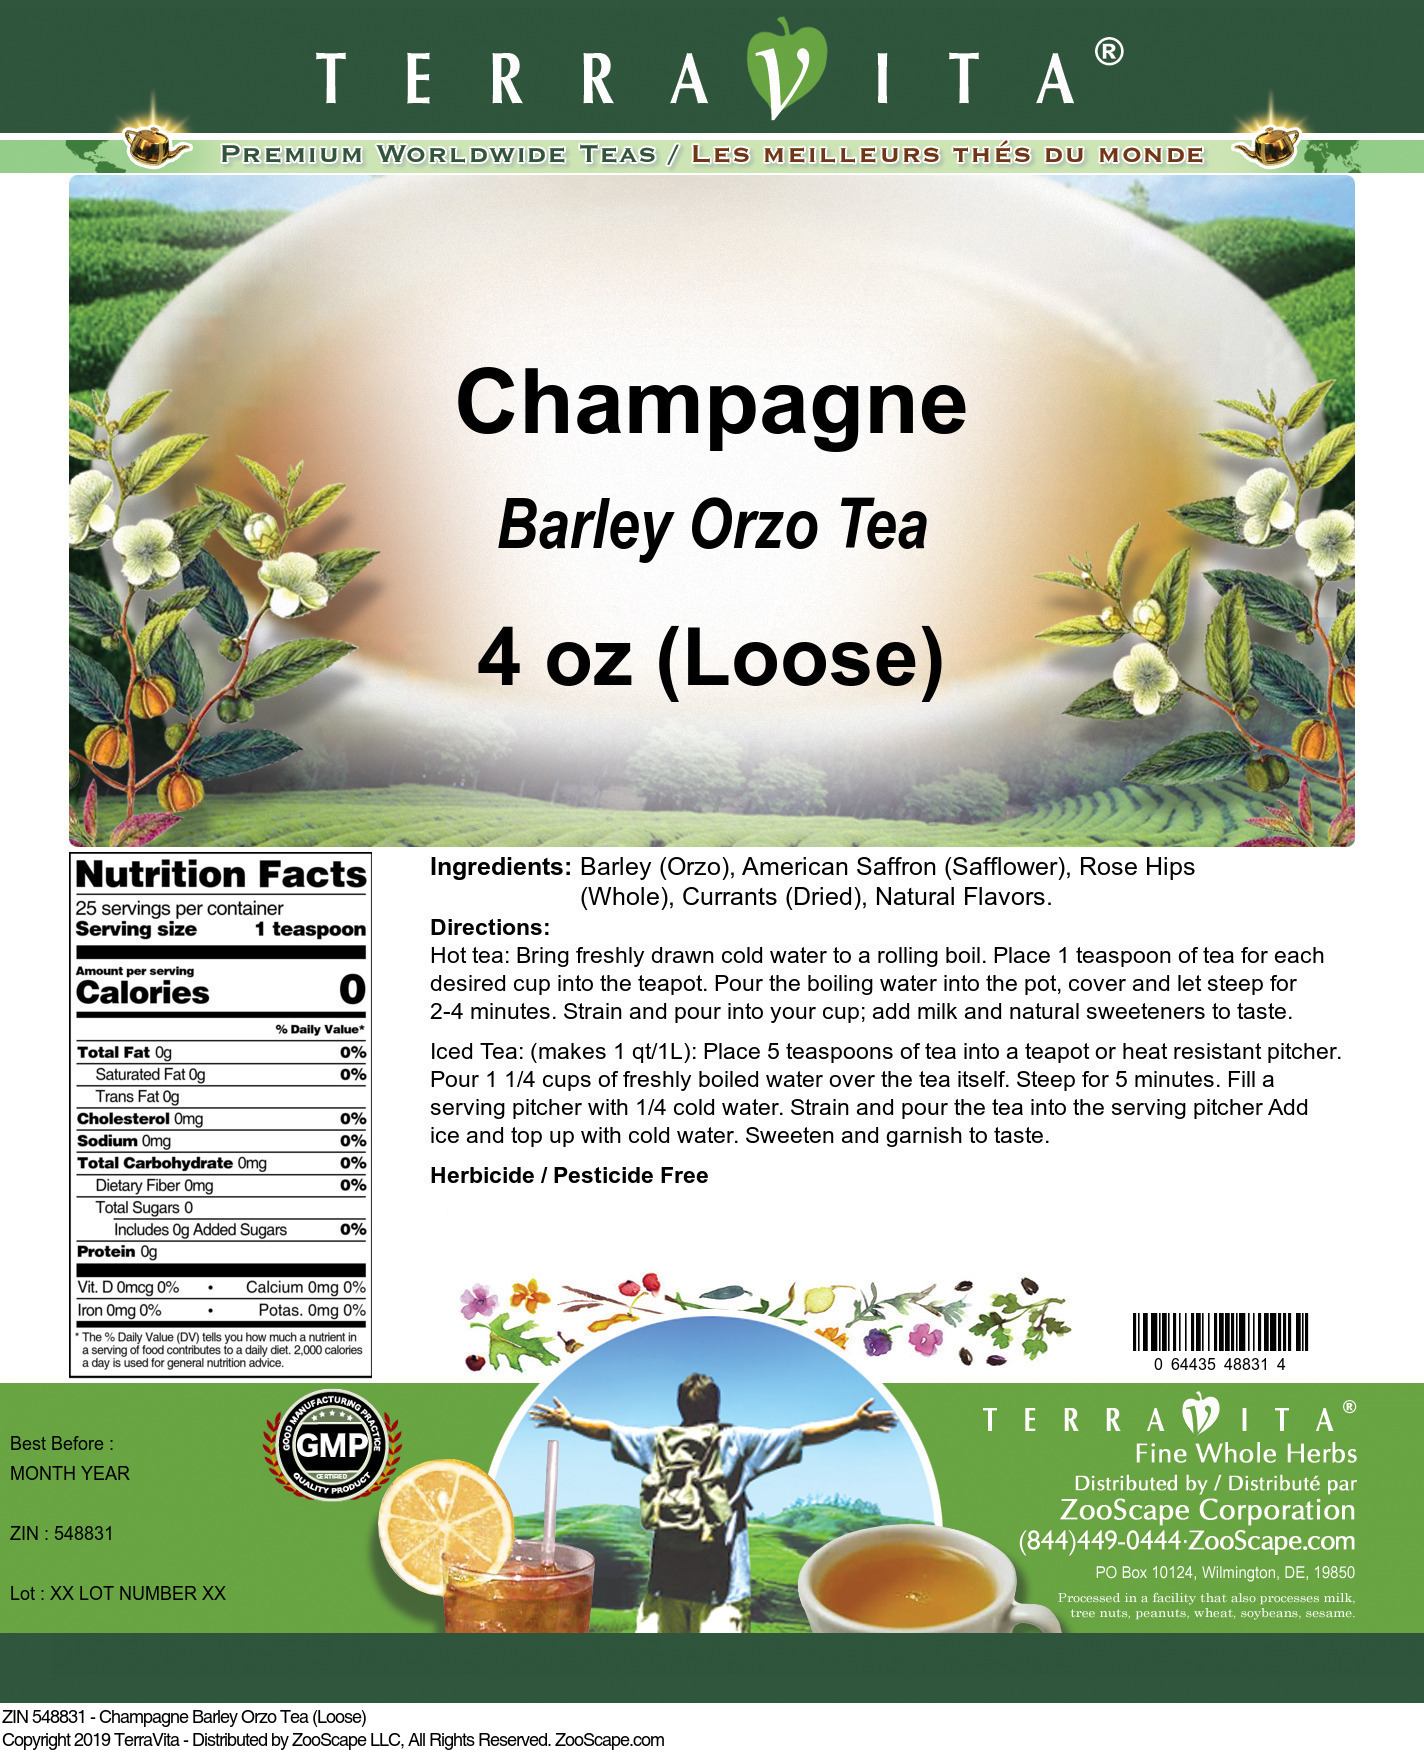 Champagne Barley Orzo